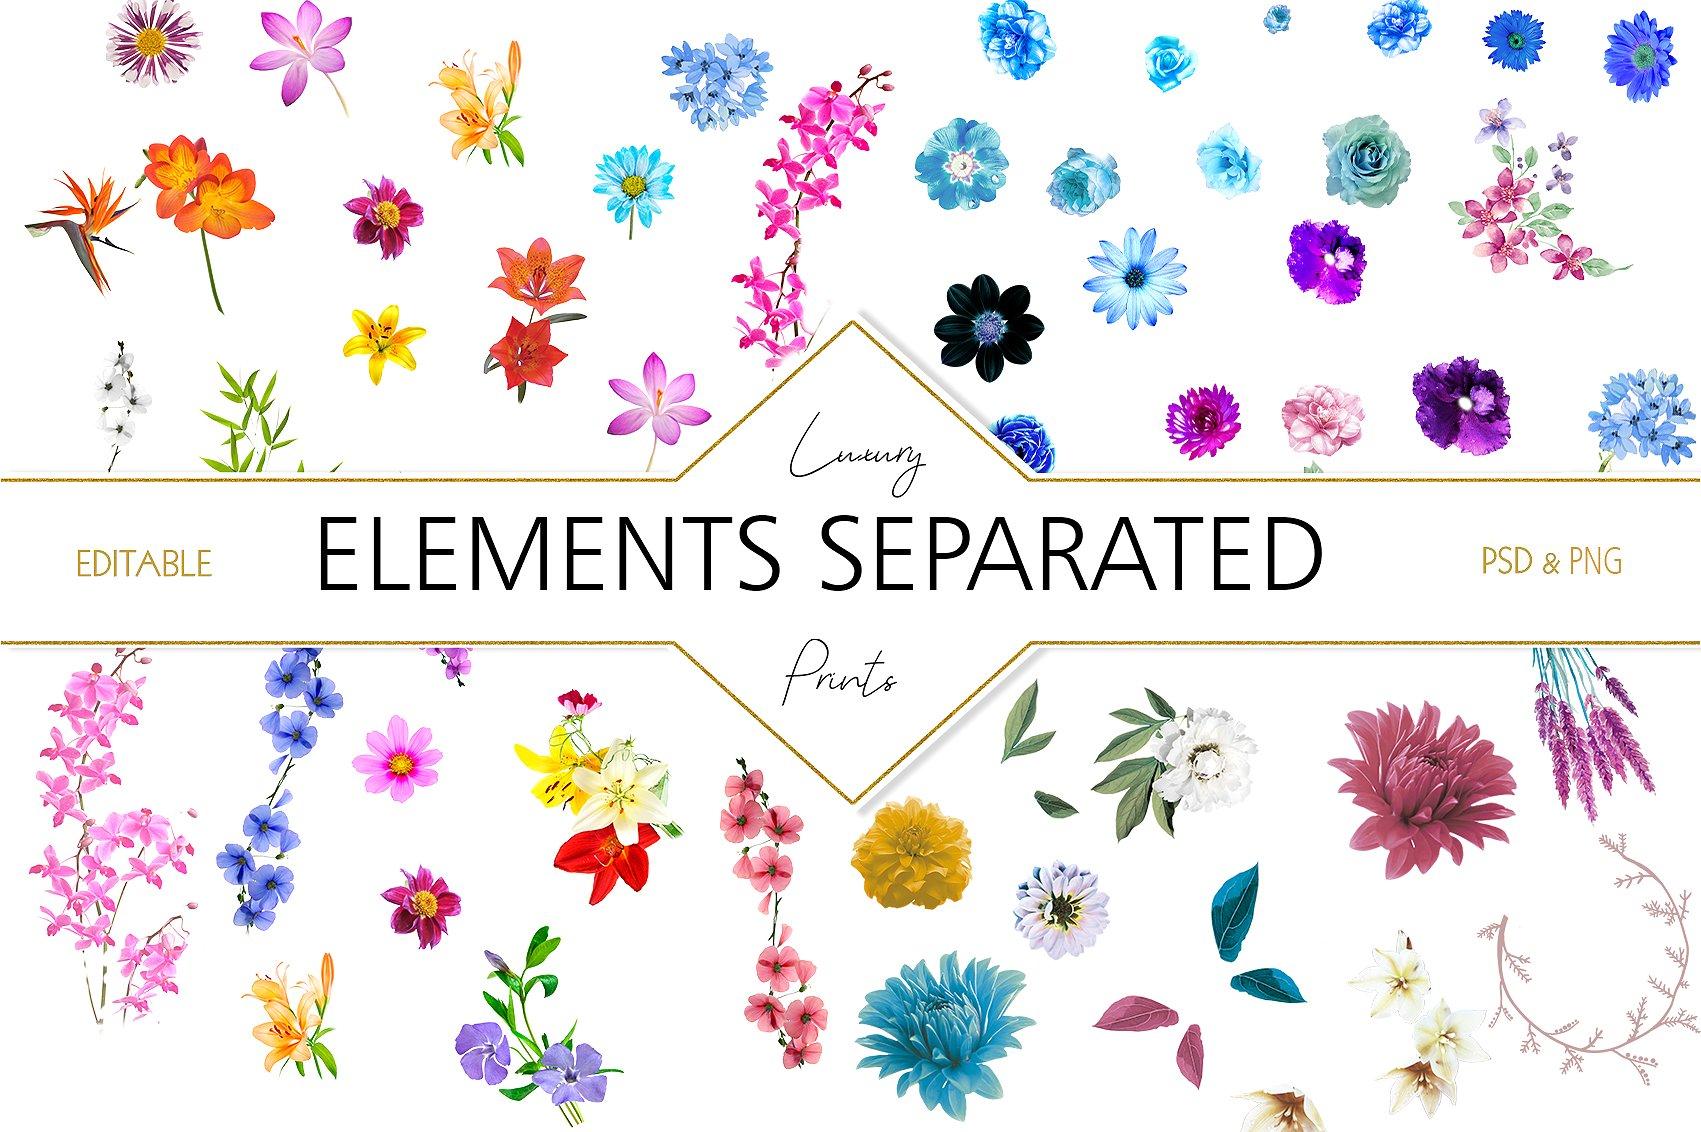 Garden of Eden Flowers Patterns clipArt example image 11